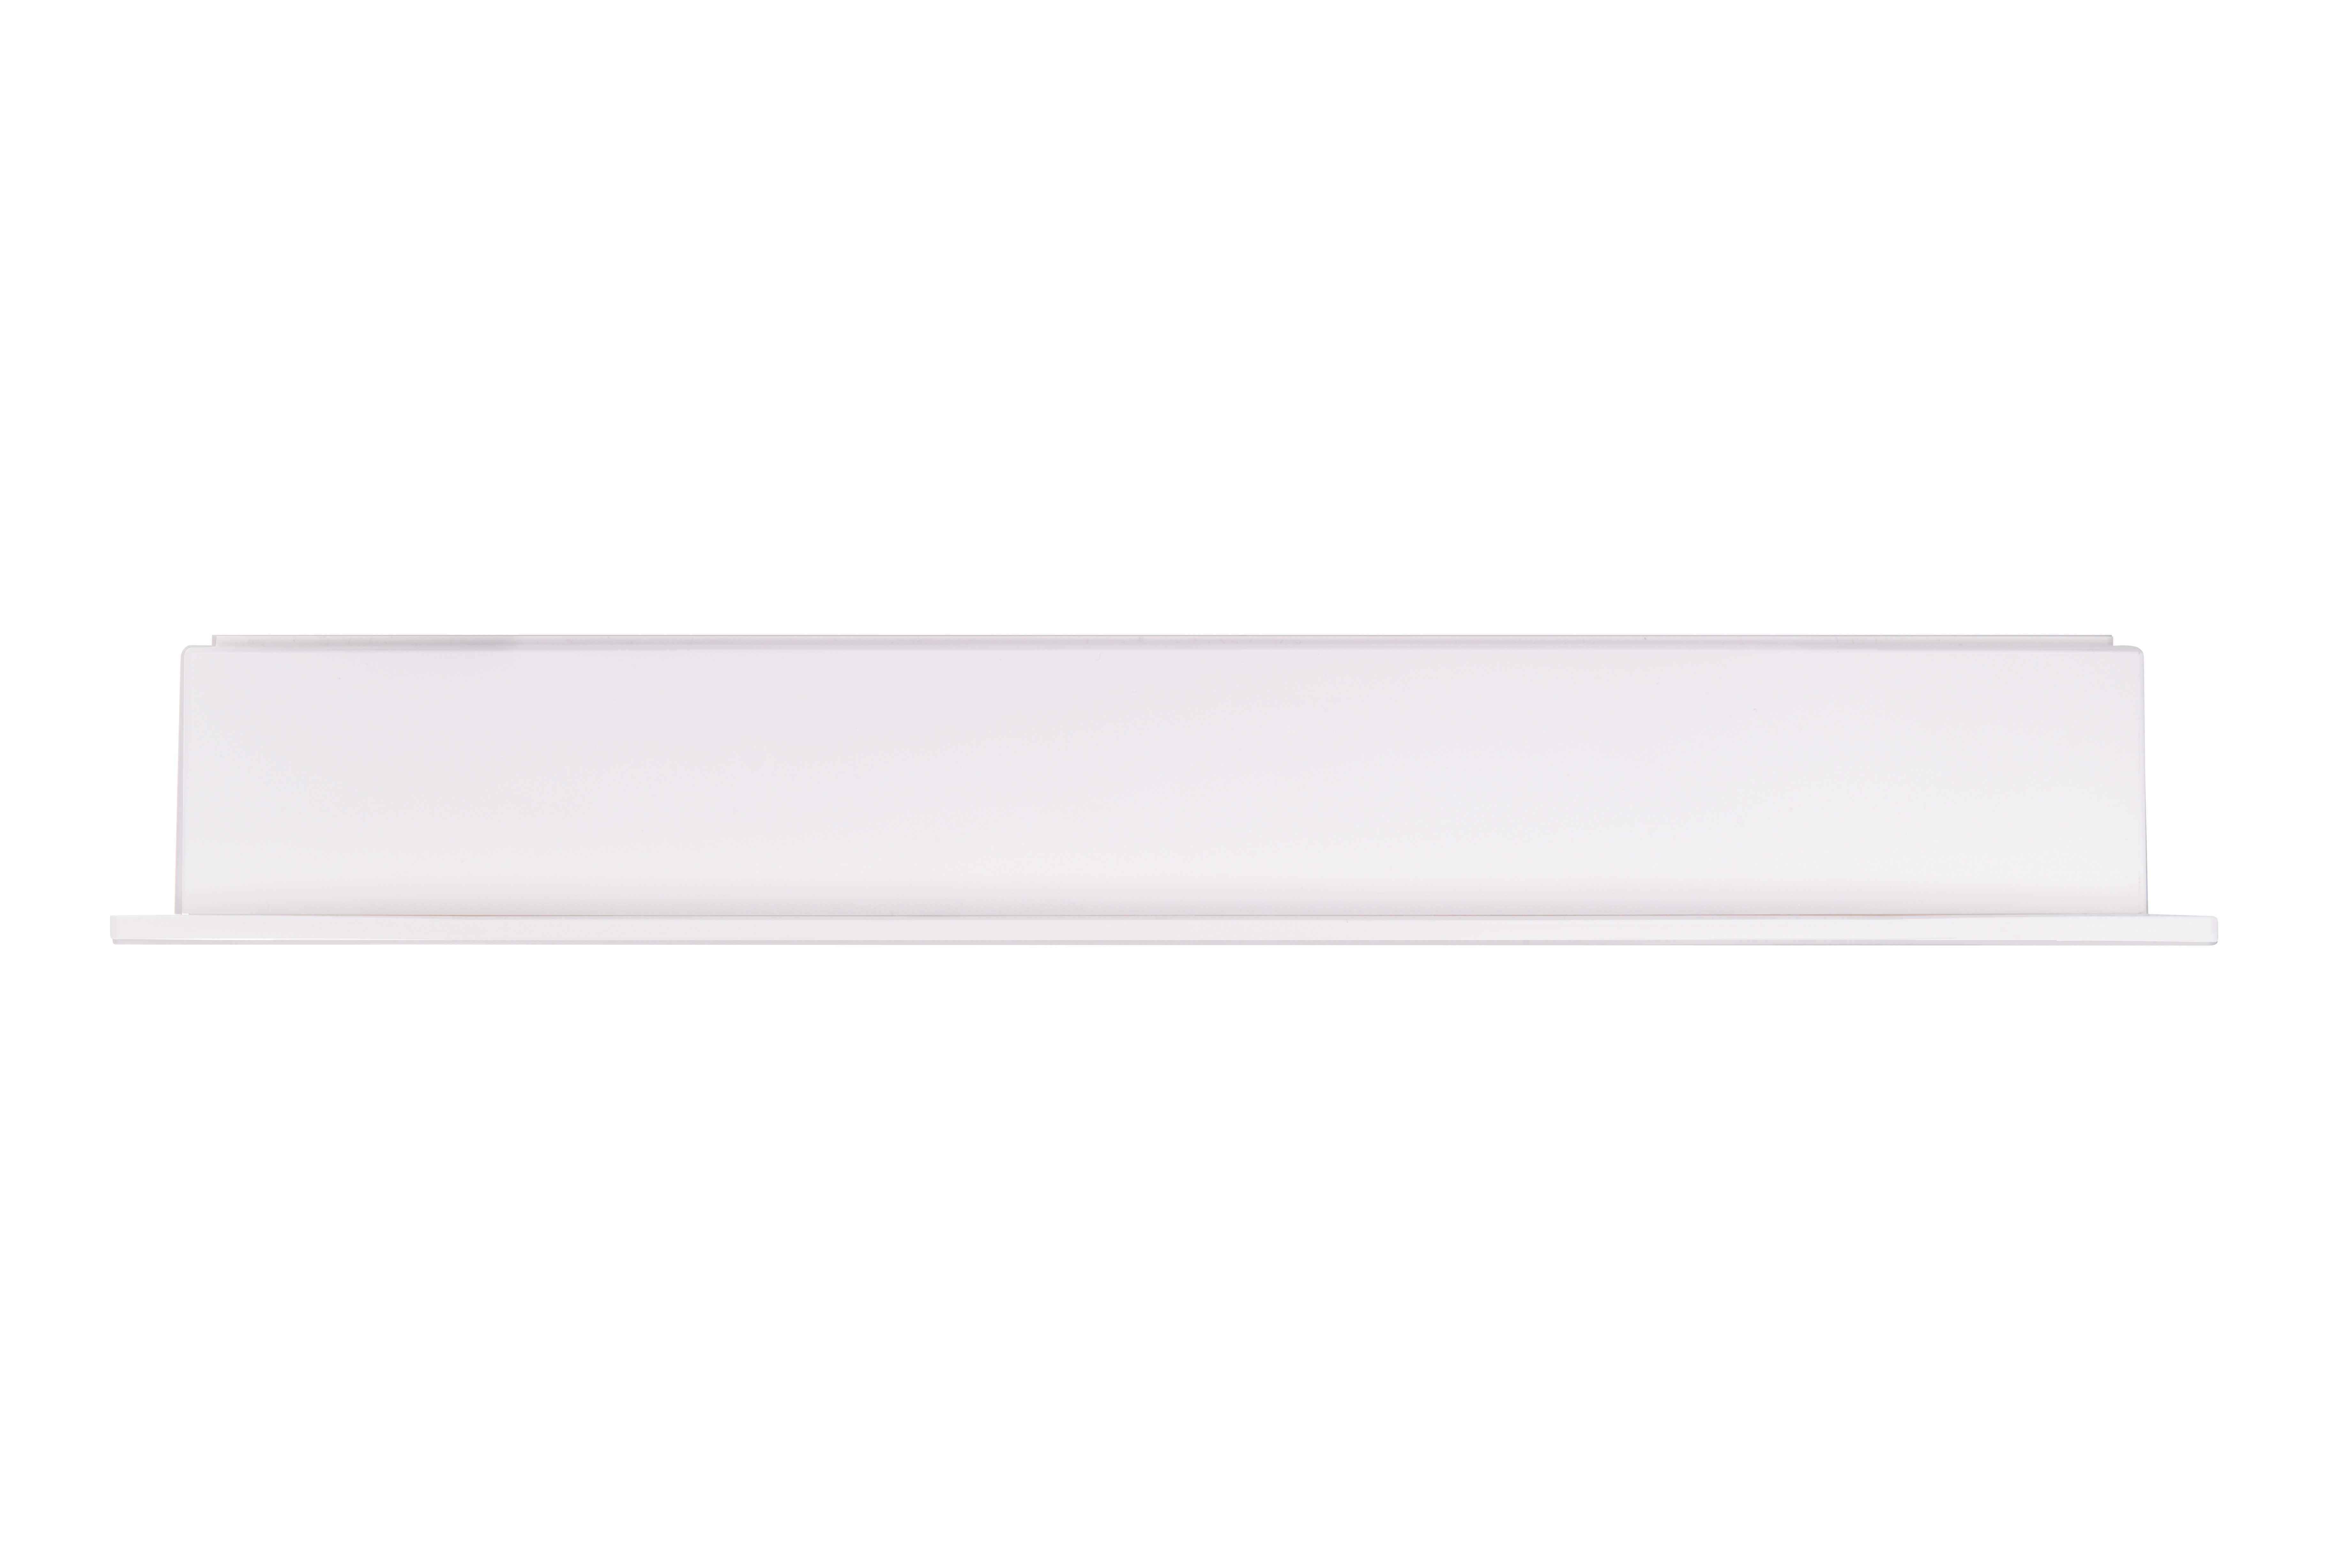 Lampa emergenta led Intelight 94552   3h mentinut test automat 5